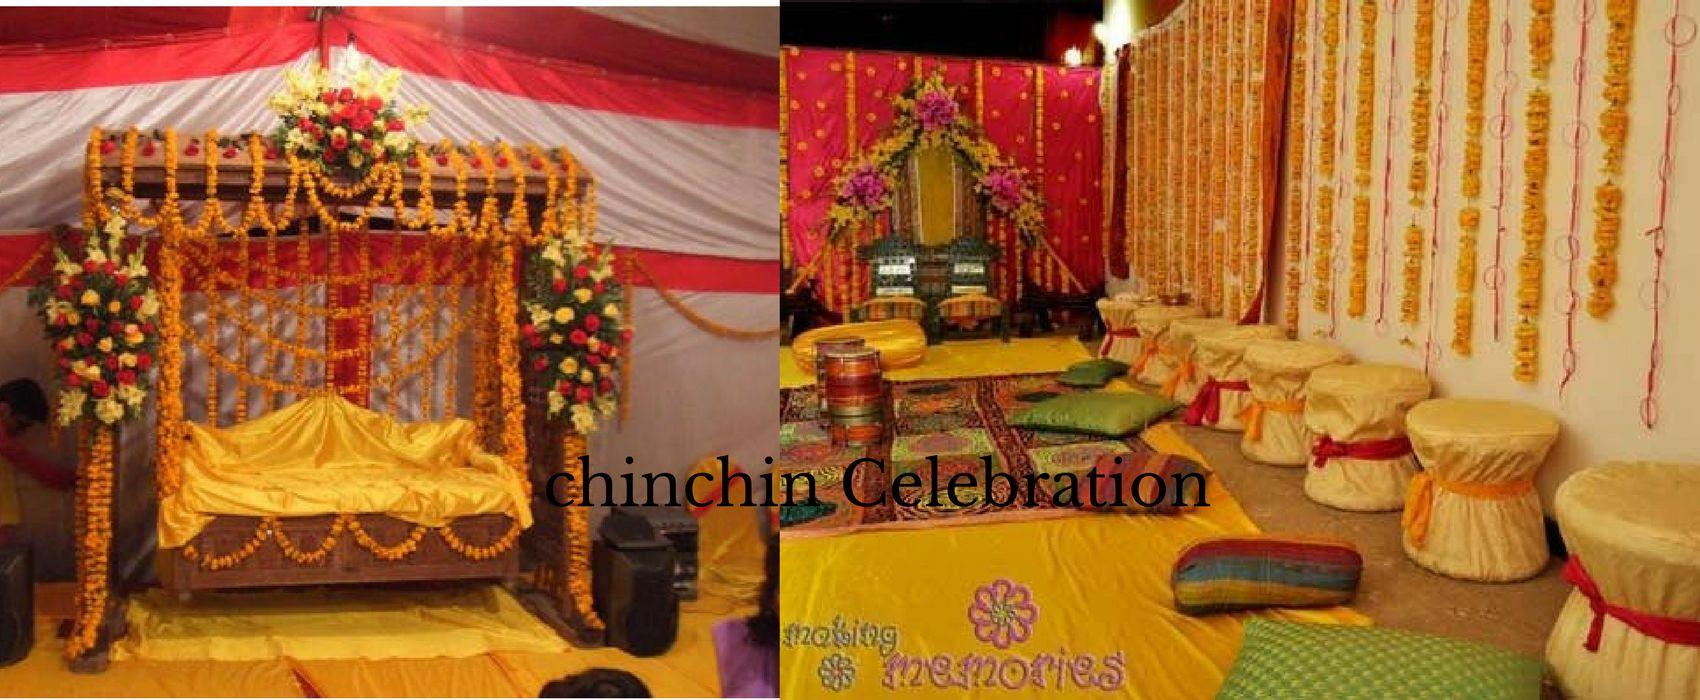 Event Management Company Gurgaon   Wedding Planner Gurgaon